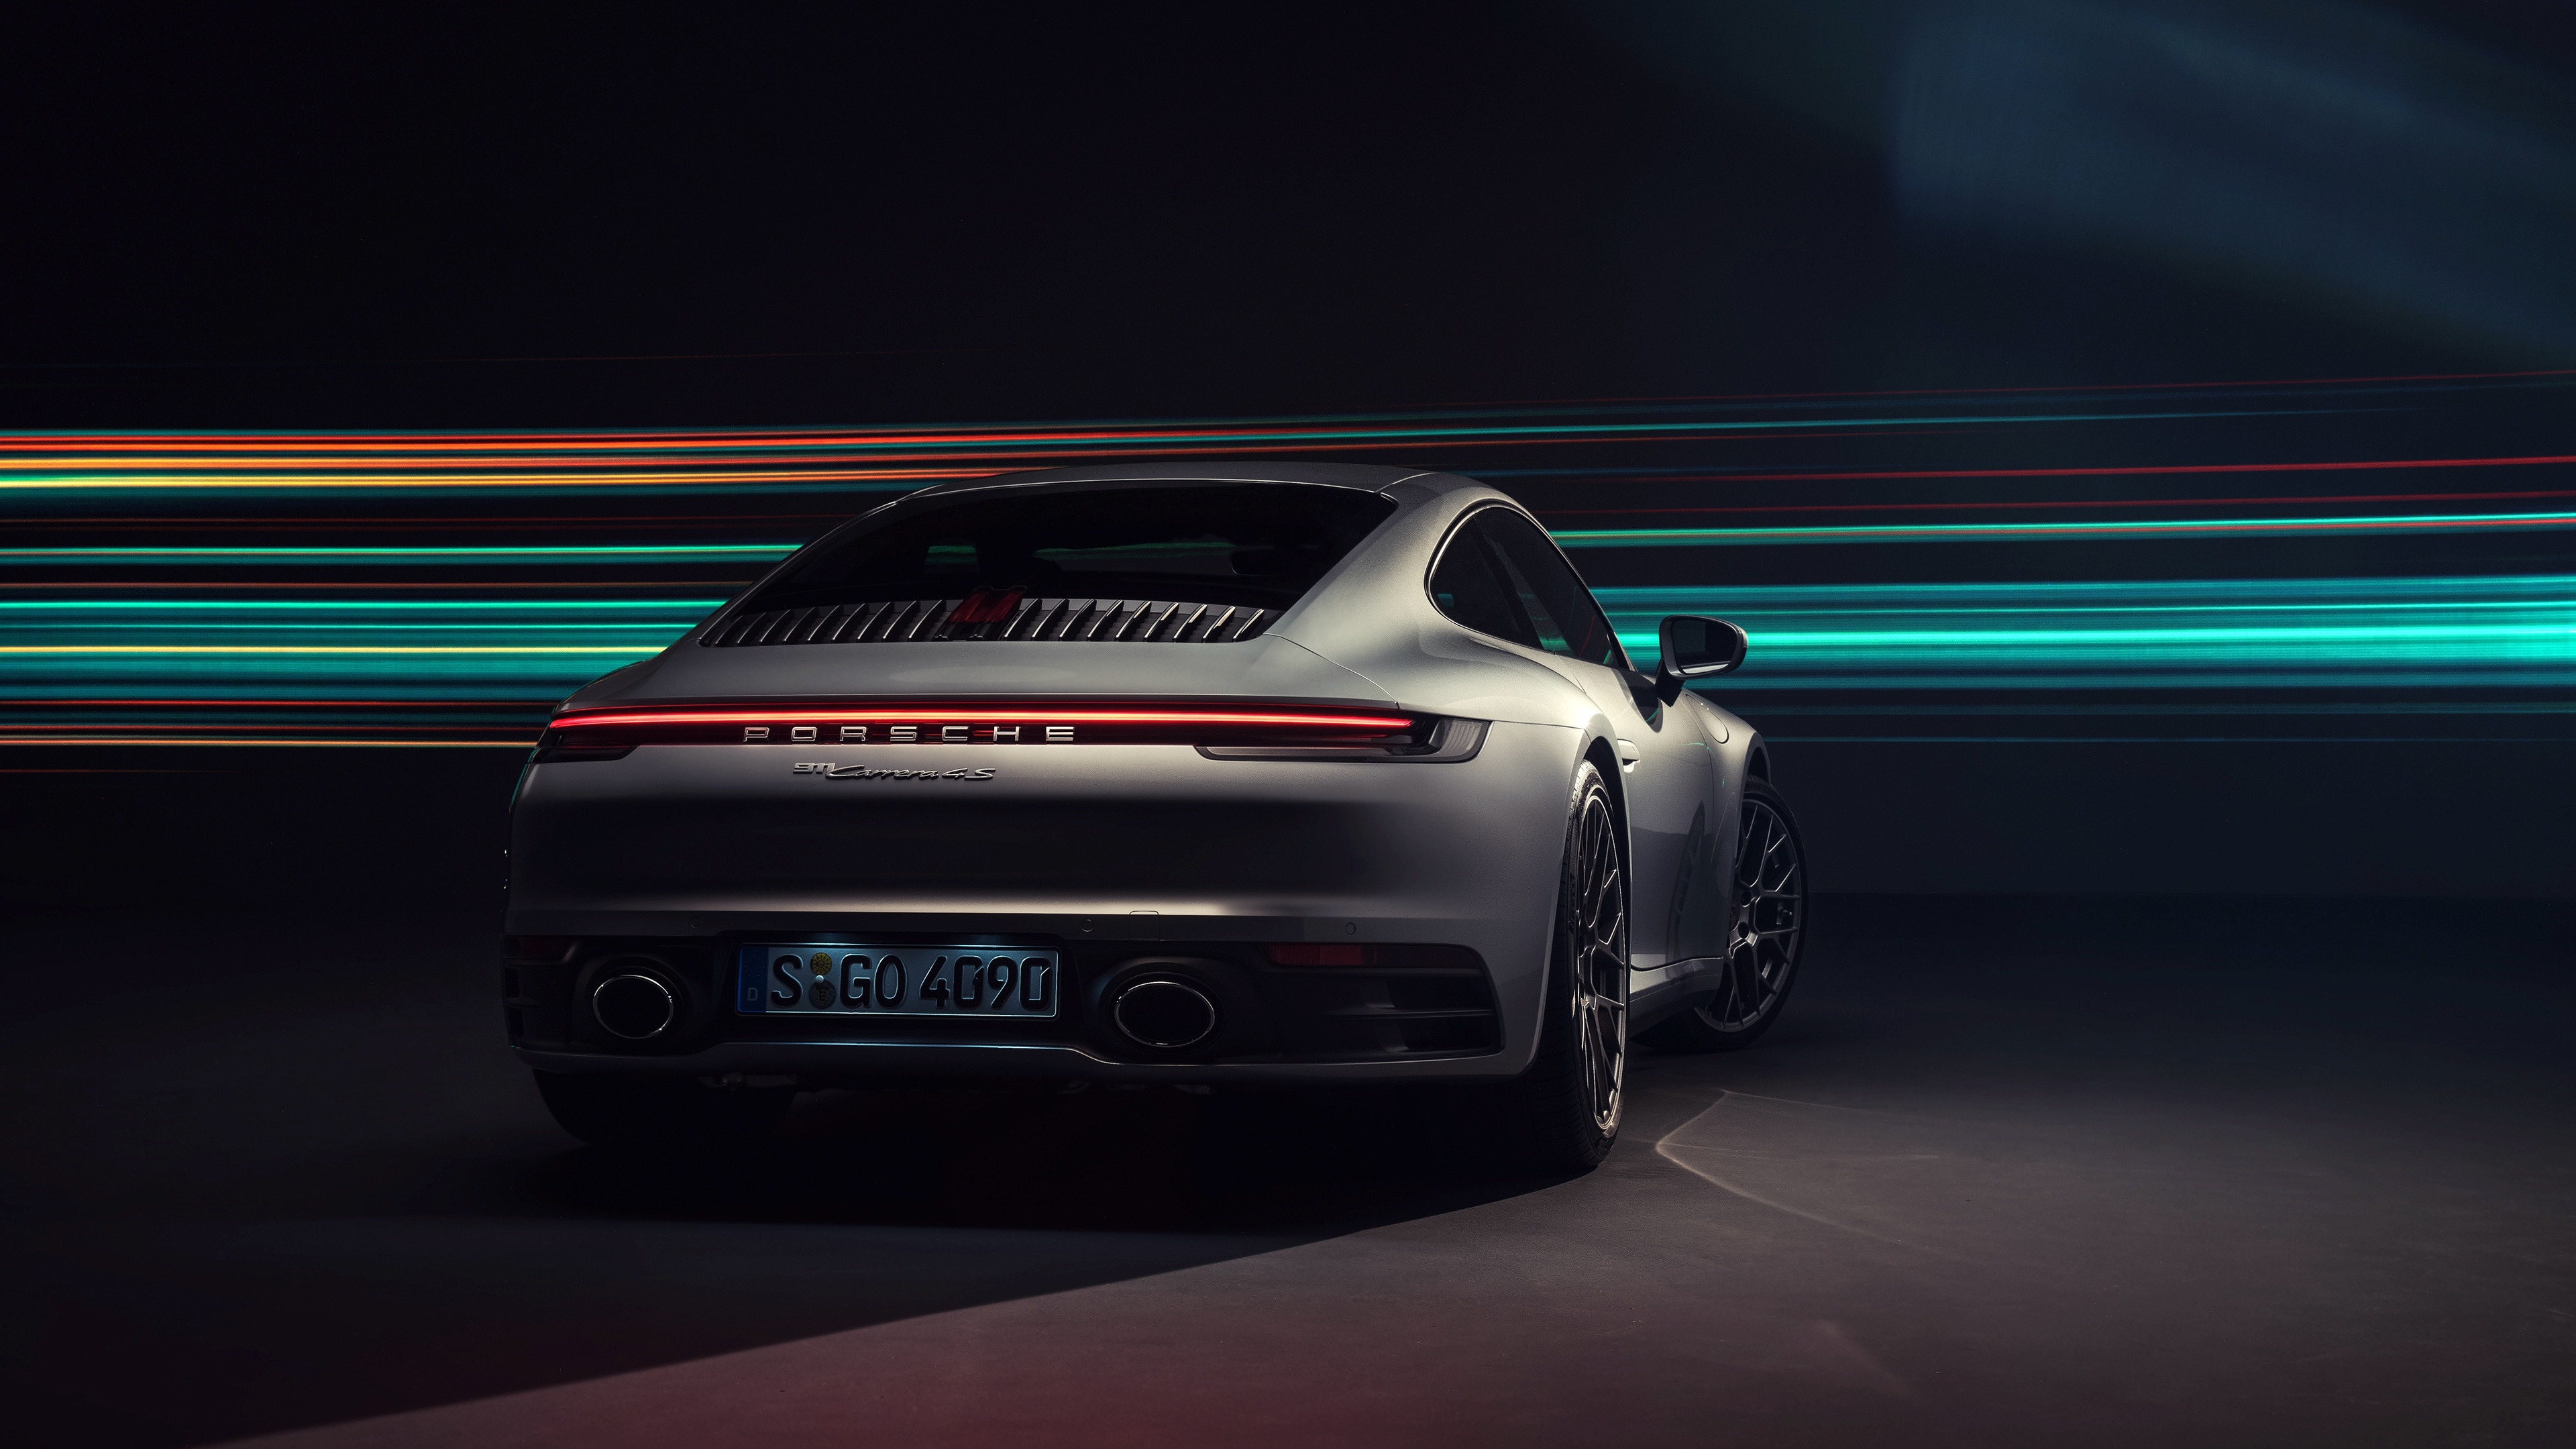 2019 porsche 911 carrera 4k 1546362656 - 2019 Porsche 911 Carrera 4k - porsche wallpapers, porsche 911 wallpapers, hd-wallpapers, cars wallpapers, 4k-wallpapers, 2019 cars wallpapers